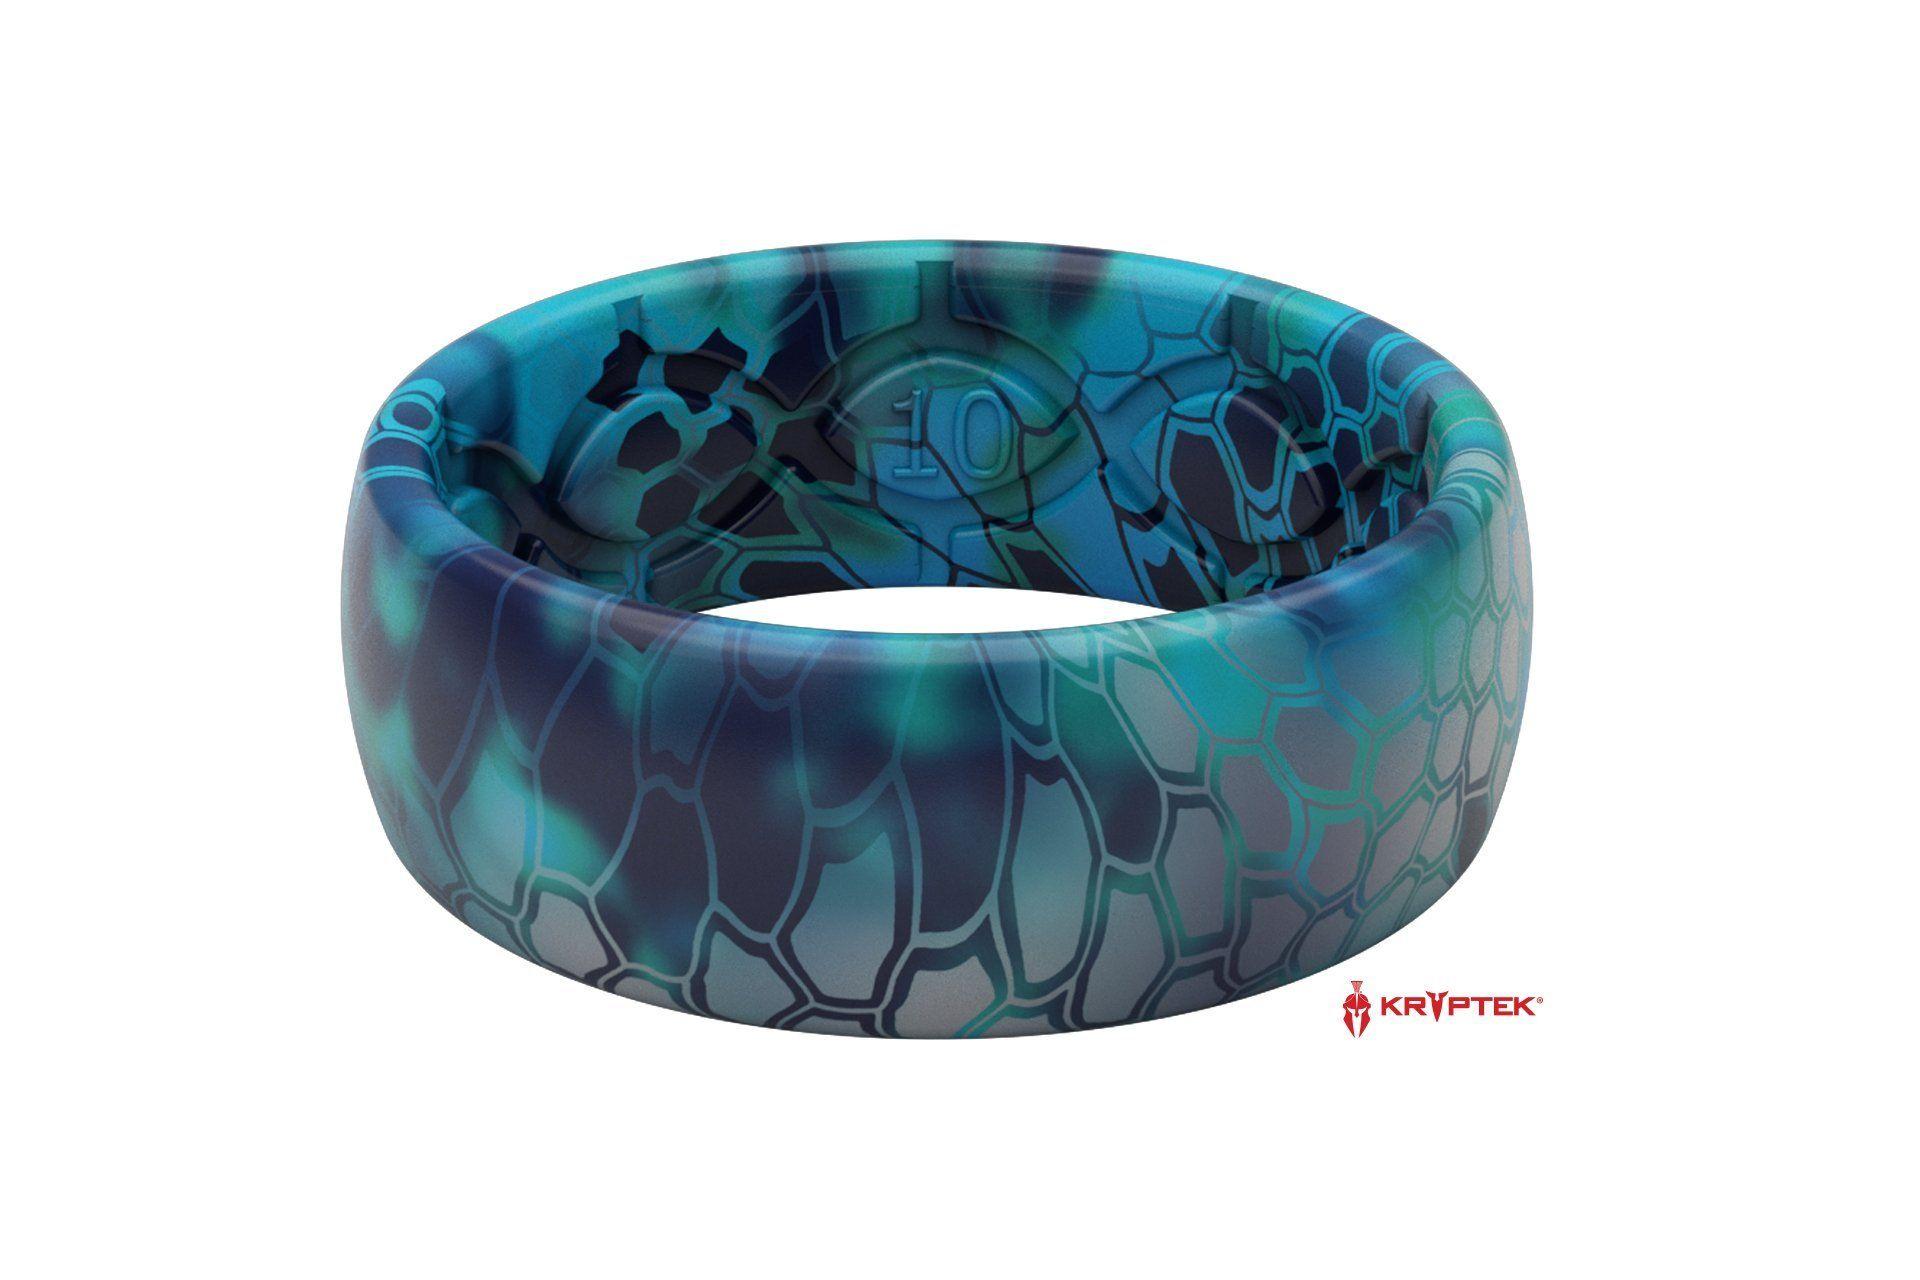 Original Camo Kryptek Pontus Camouflage Silicone rings